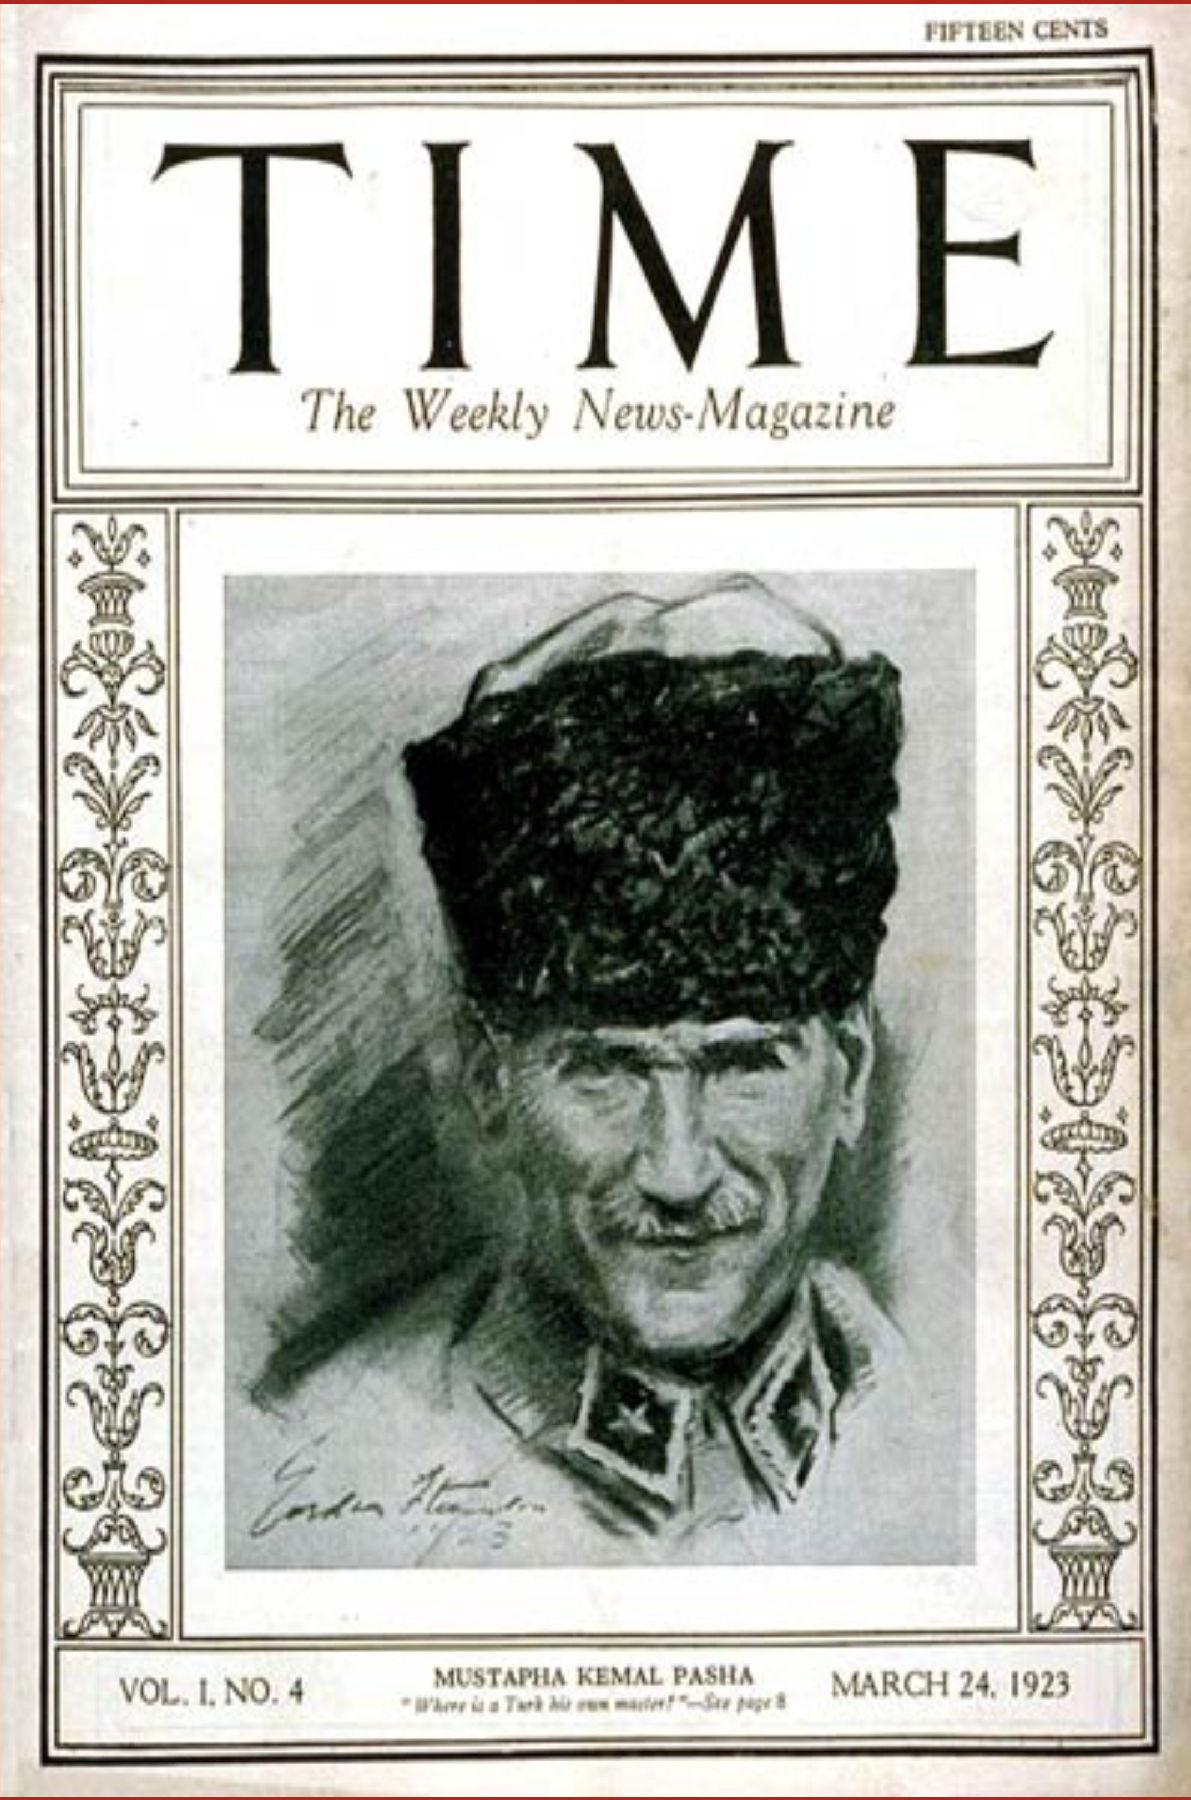 24 Mart 1923 - Mustafa Kemal Time Dergisi'ne kapak oldu